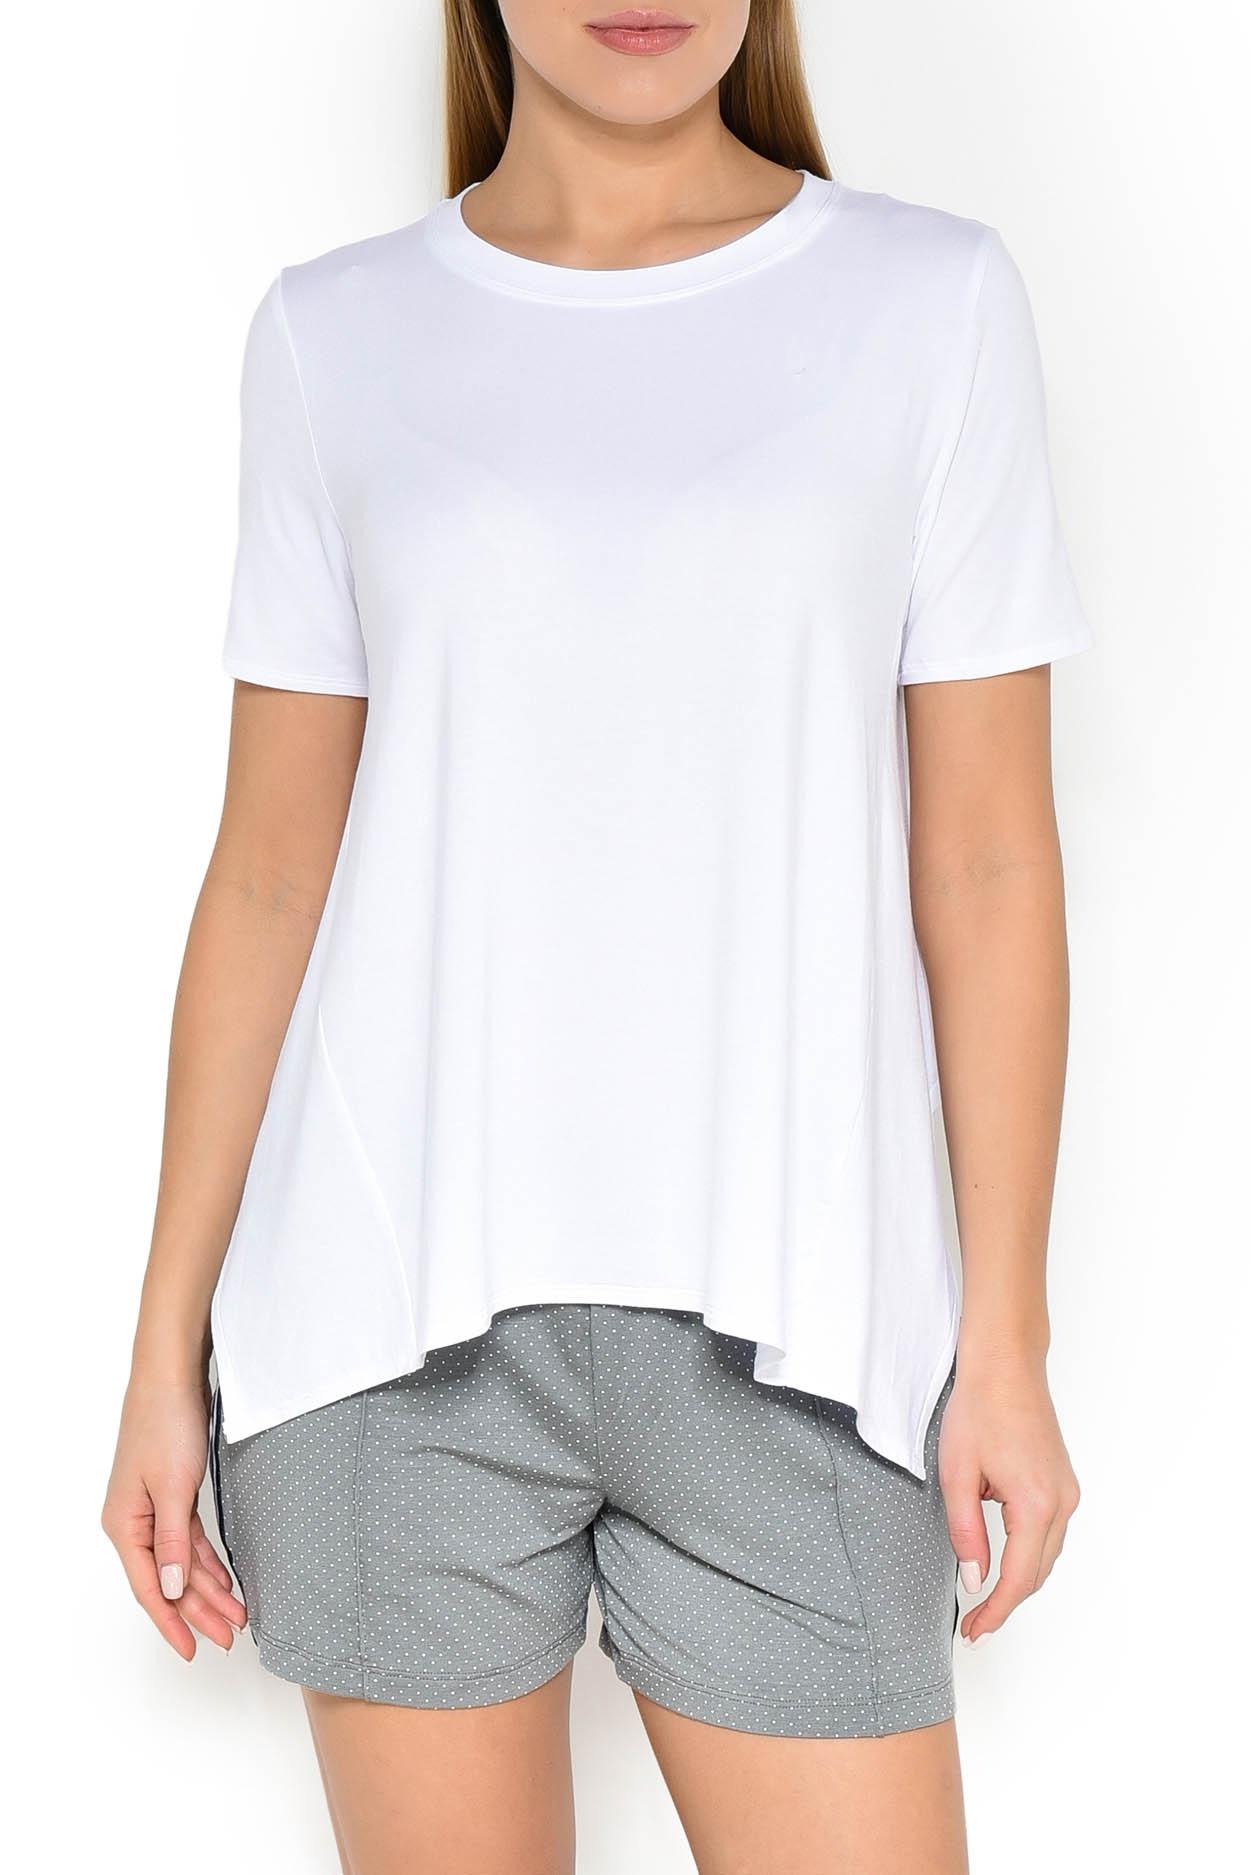 Женская футболка 850307H Jockey